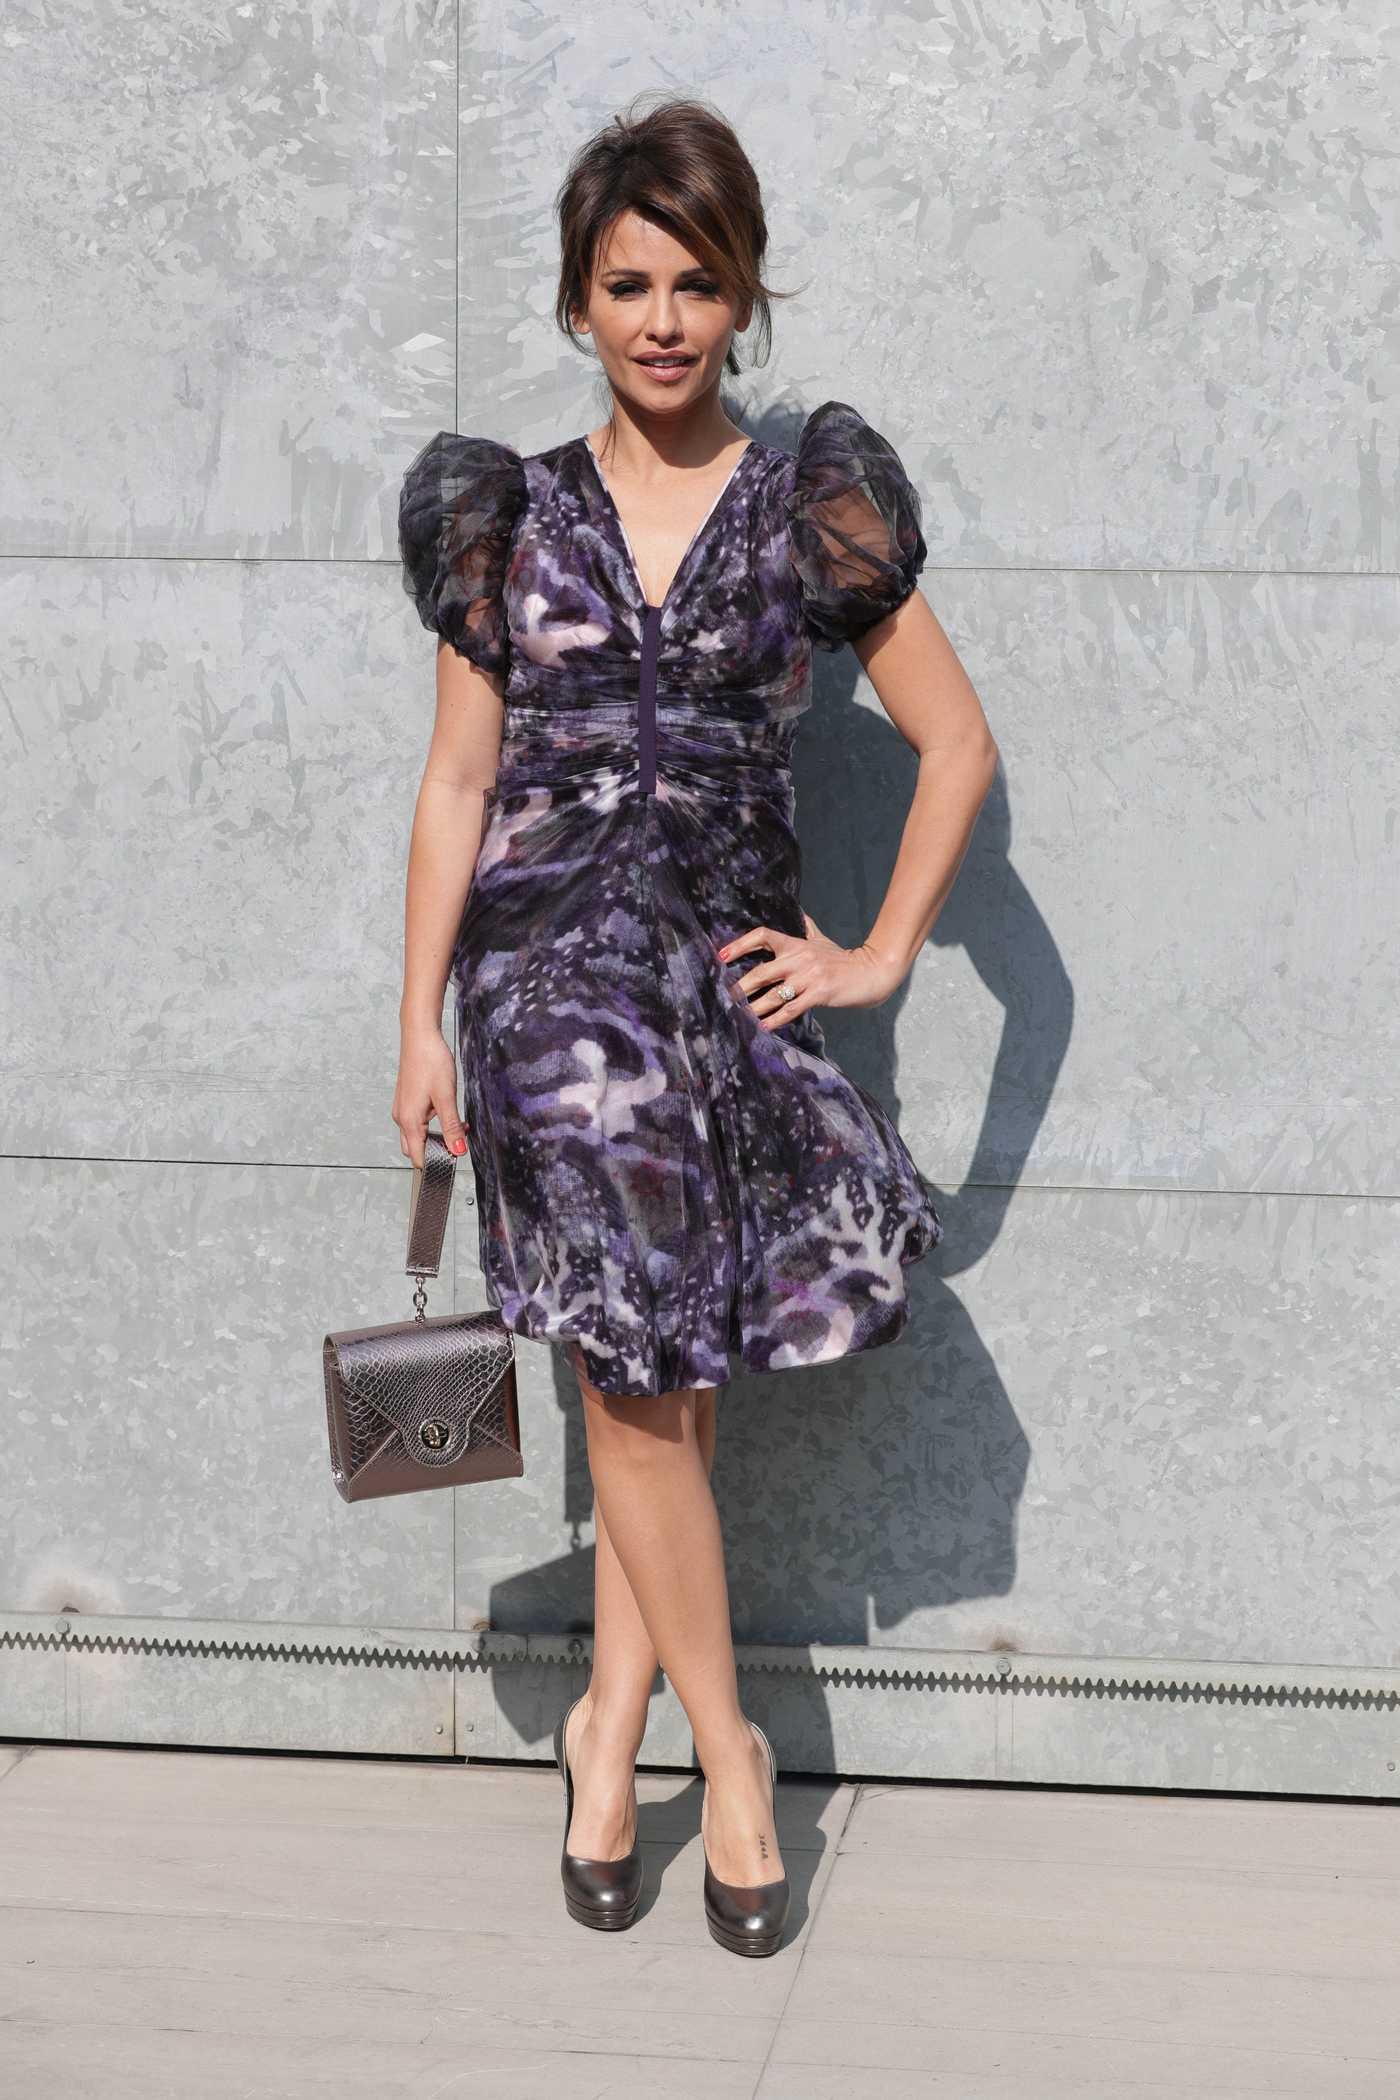 Monica Cruz at Armani Fashion Show During the Milan Fashion Week 02/27/2017